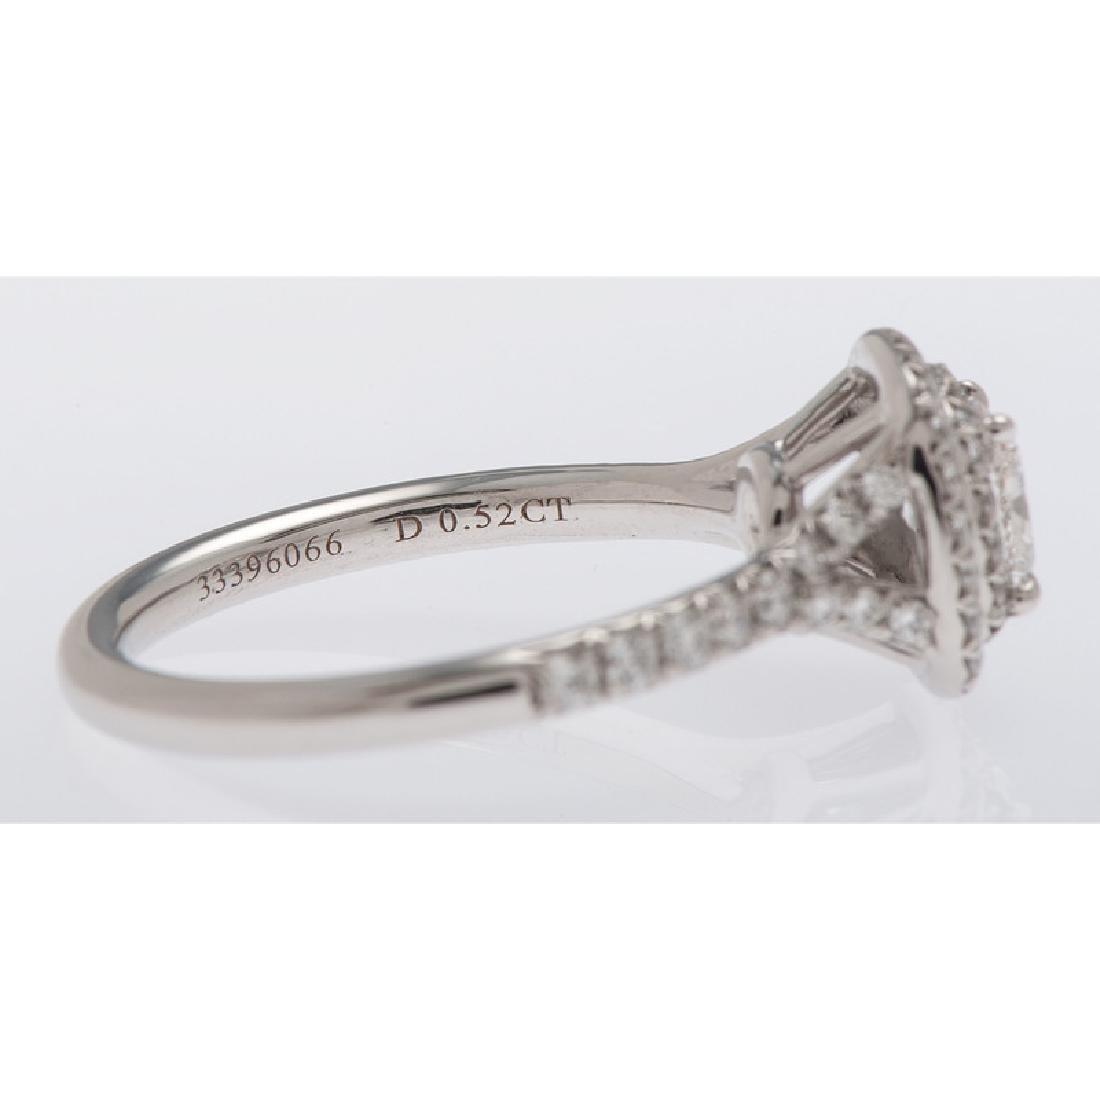 Tiffany & Co. Platinum Soleste Diamond Ring - 3